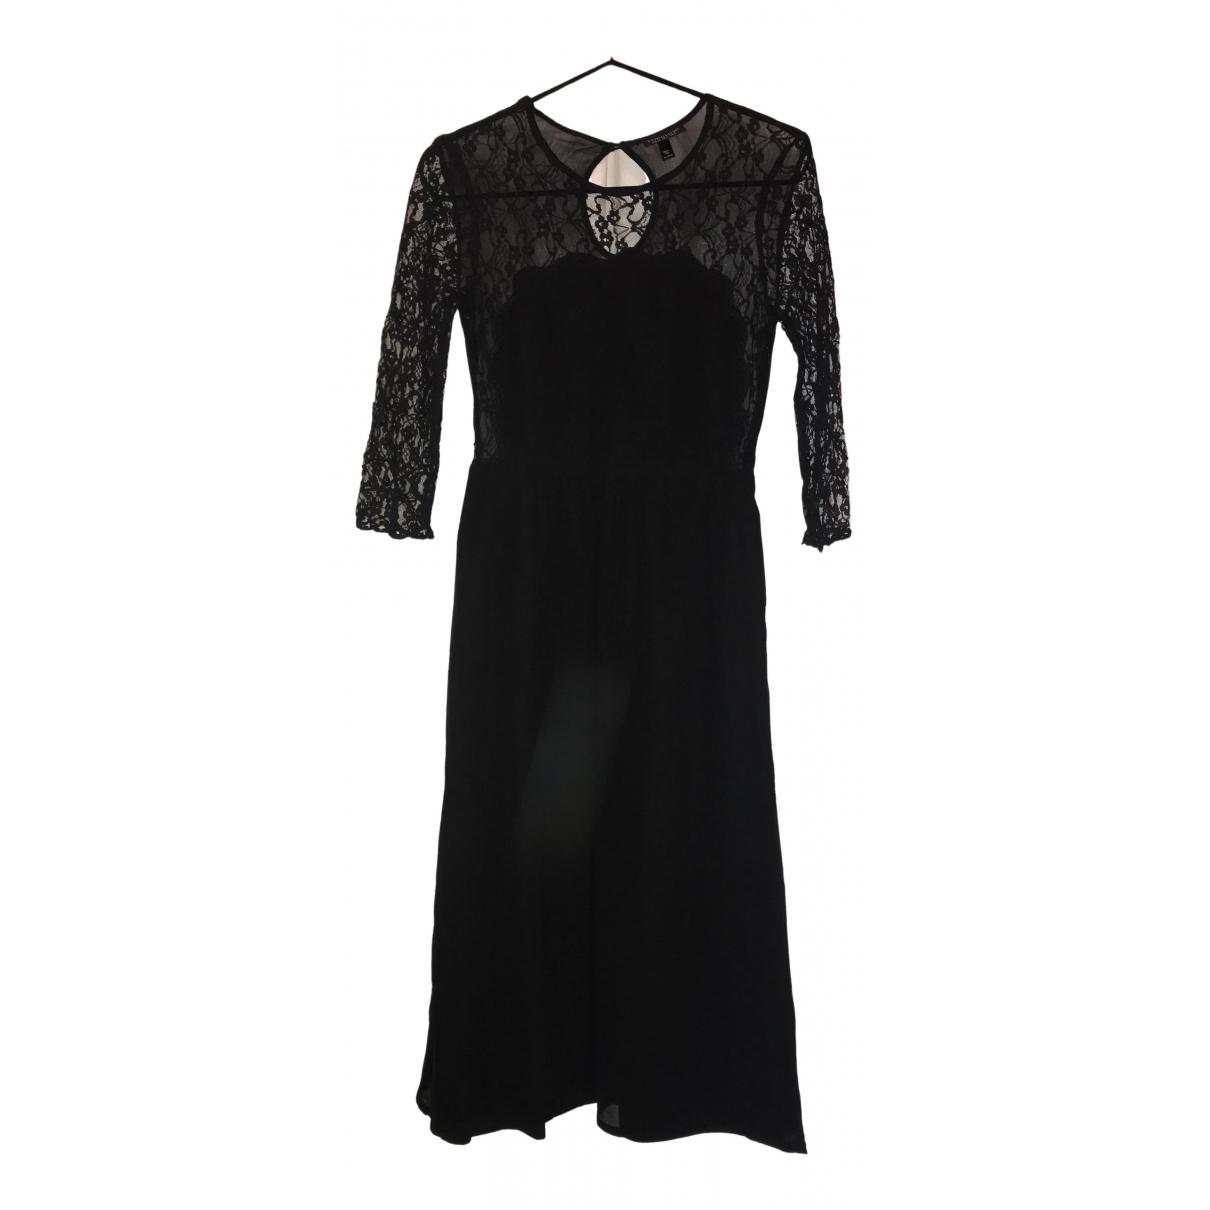 Tophop Boutique \N Kleid in  Schwarz Synthetik